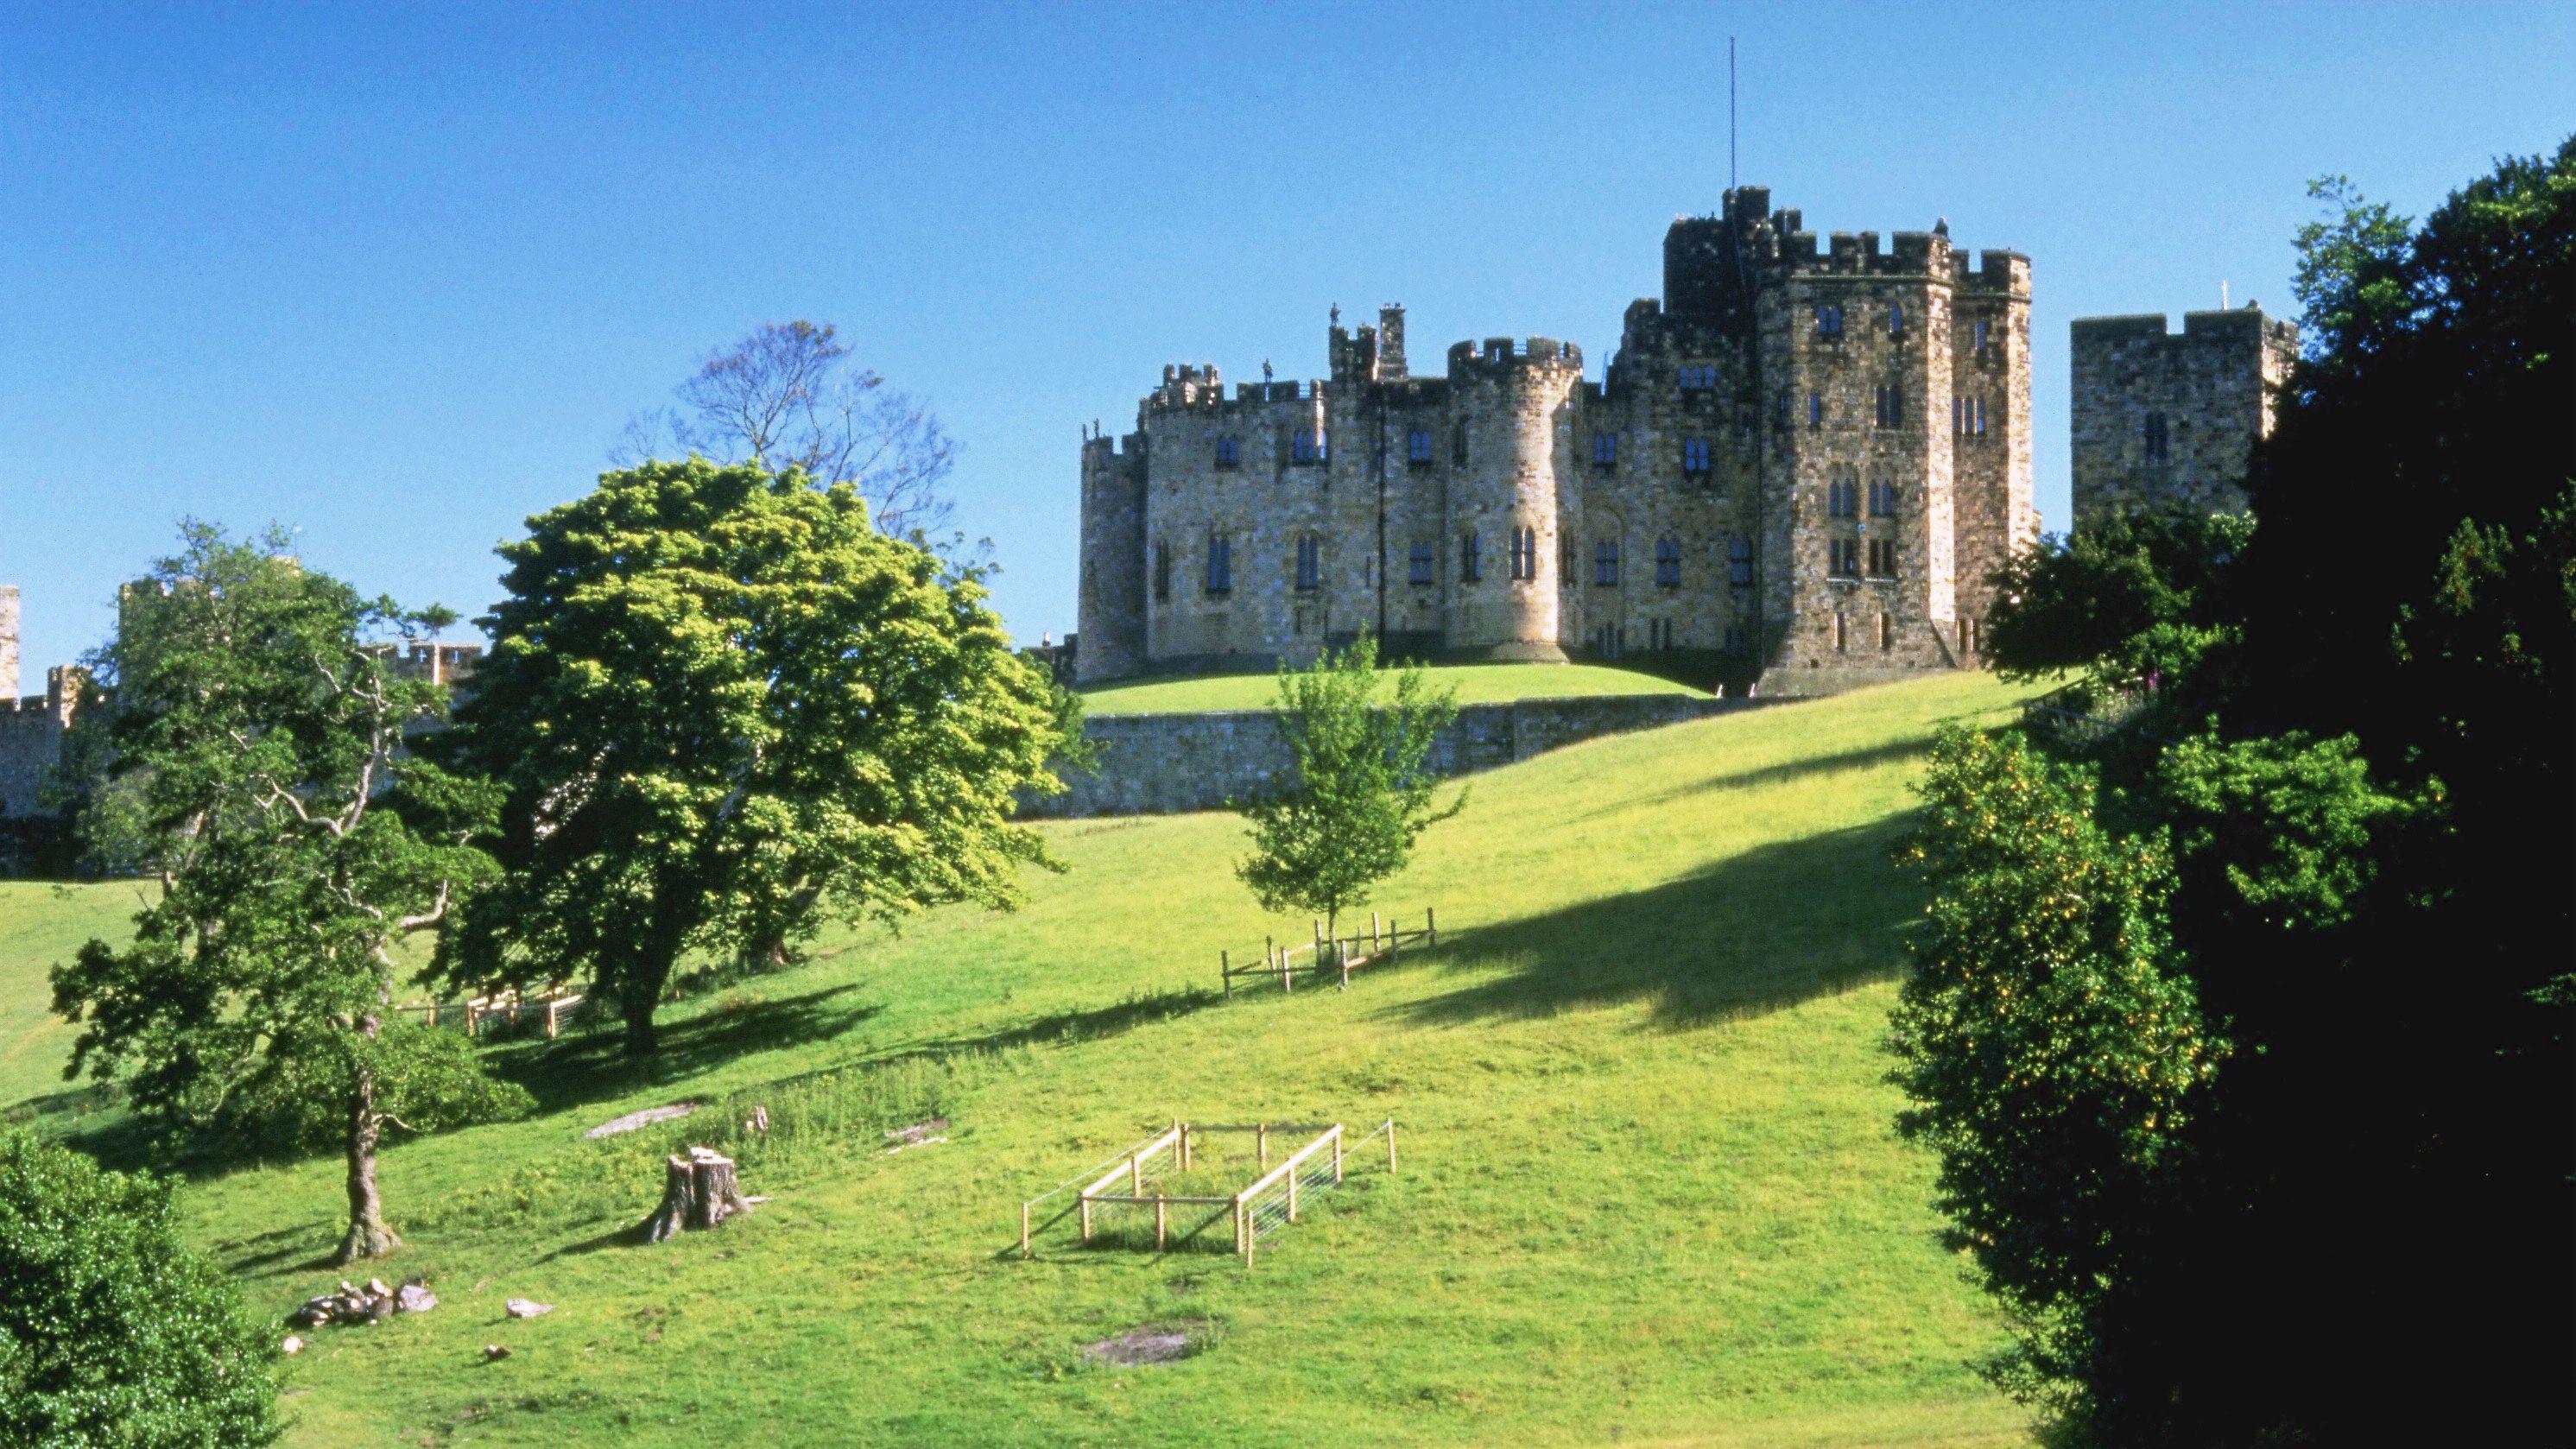 Alnwick Castle on hill in Scotland